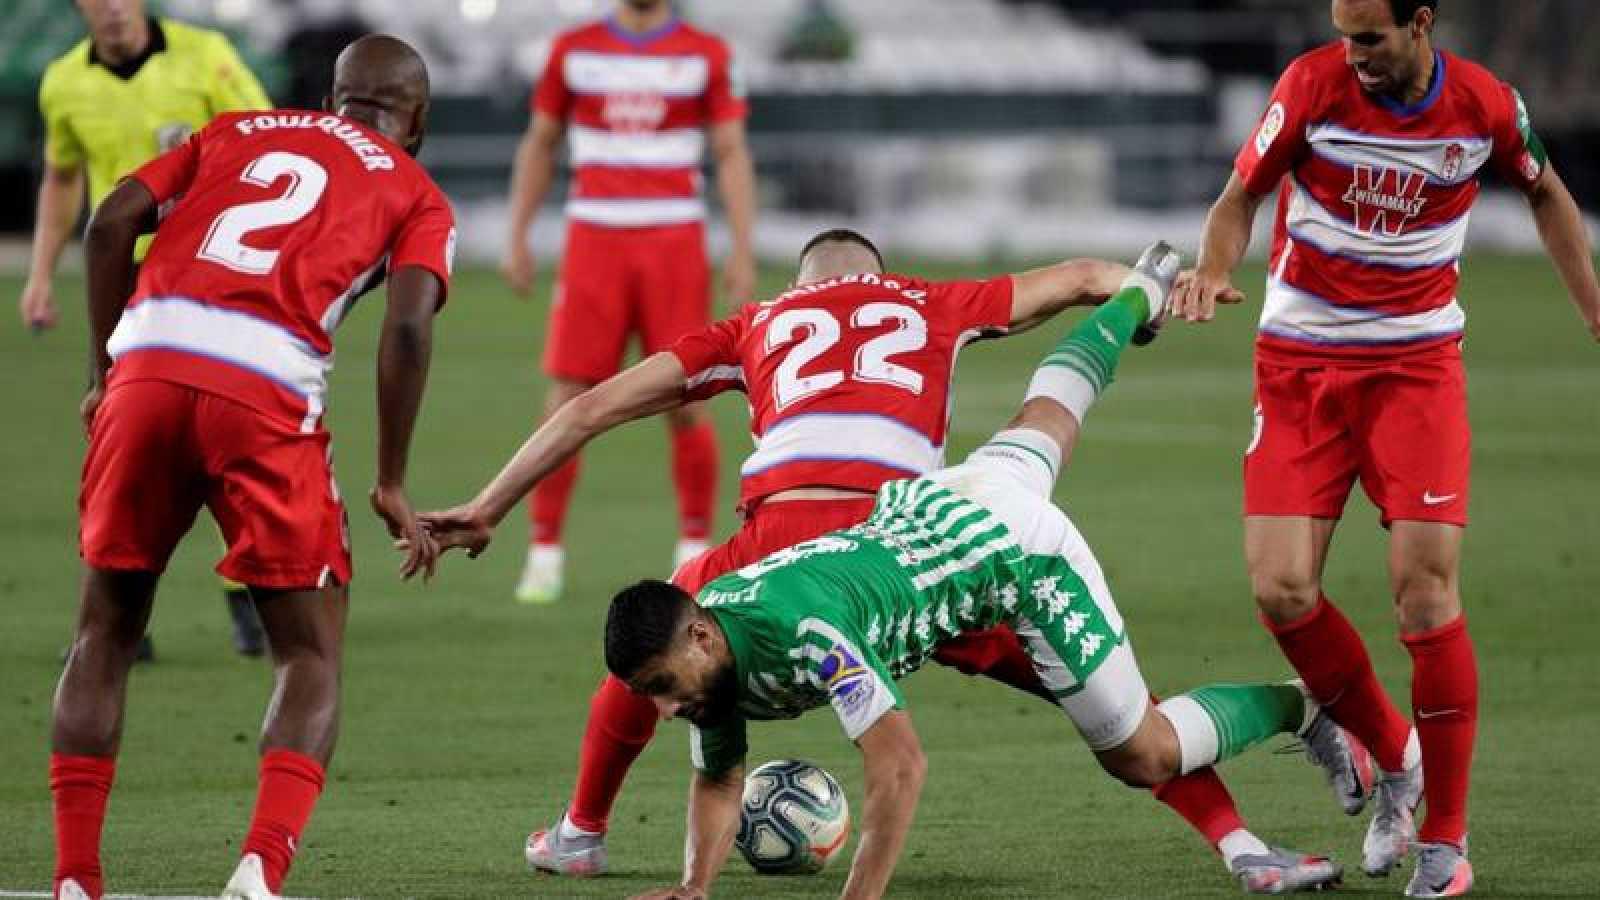 El centrocampista francés del Real Betis, Nabil Fekir, cae ante el defensa portugués del Granada, Domingos Duarte.